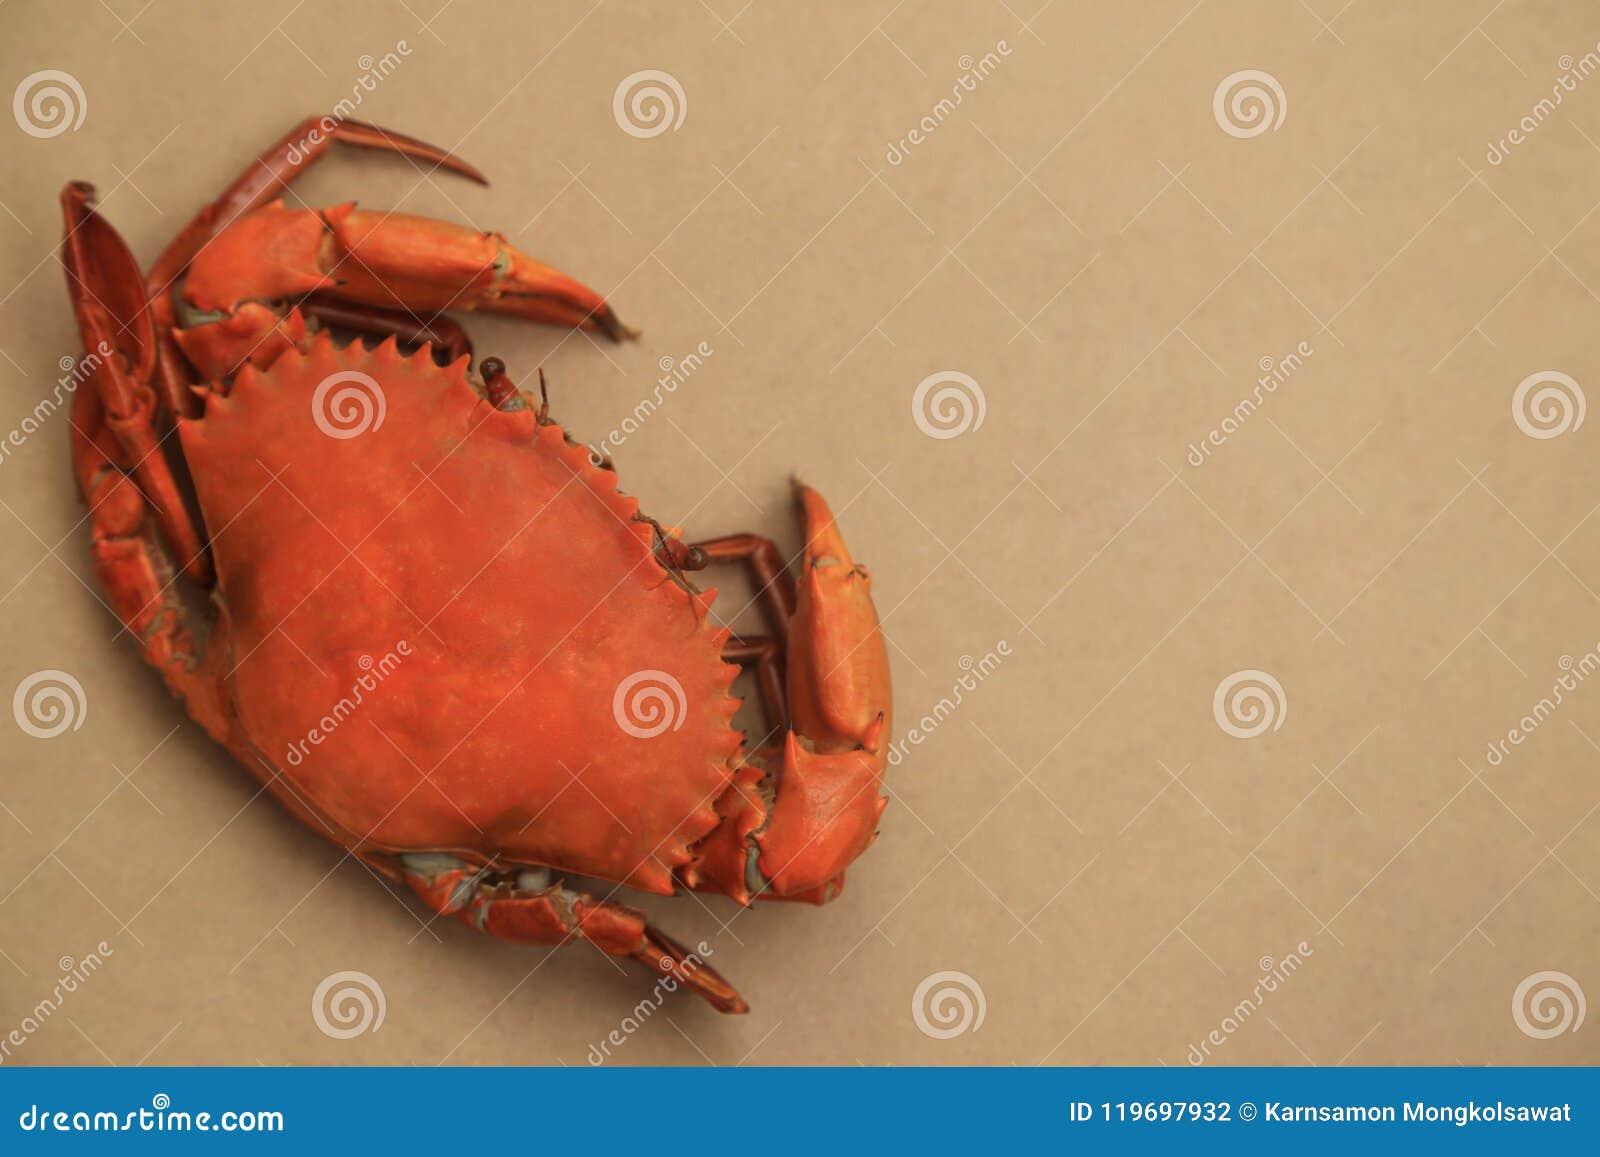 Duzi odparowani kraby na naturalnym brown tle